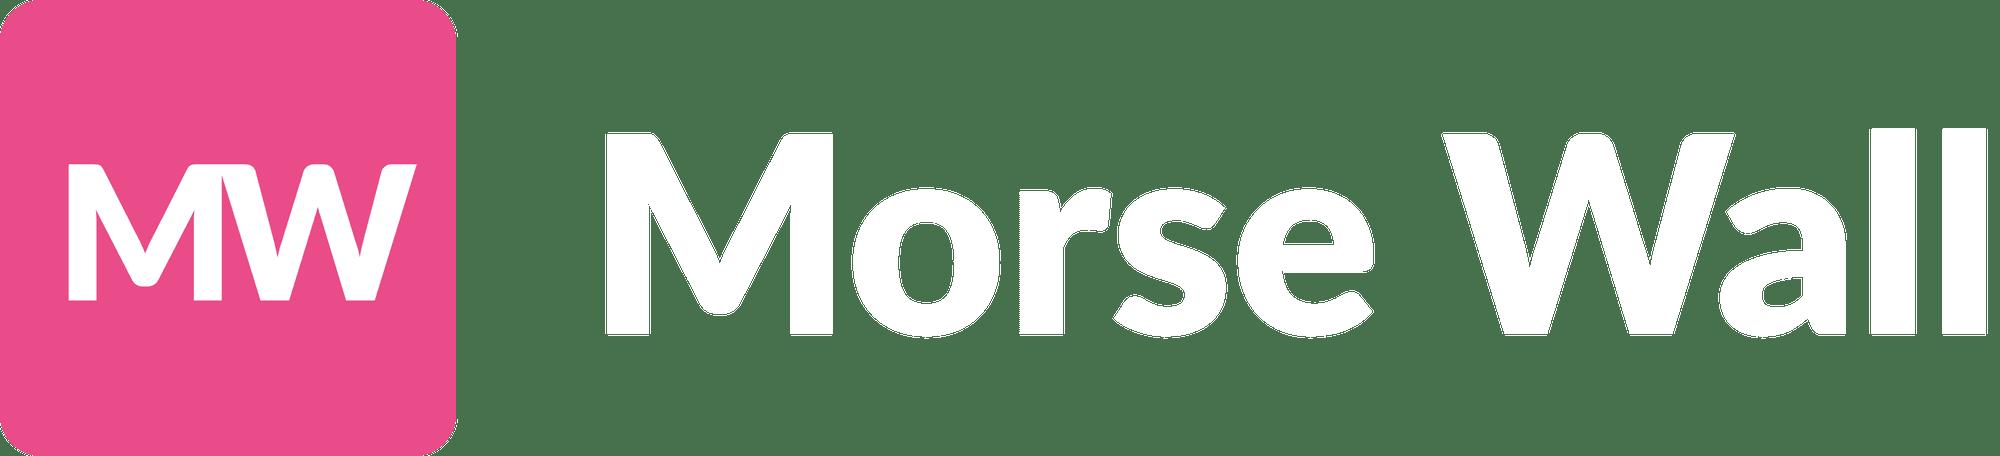 Morse Wall